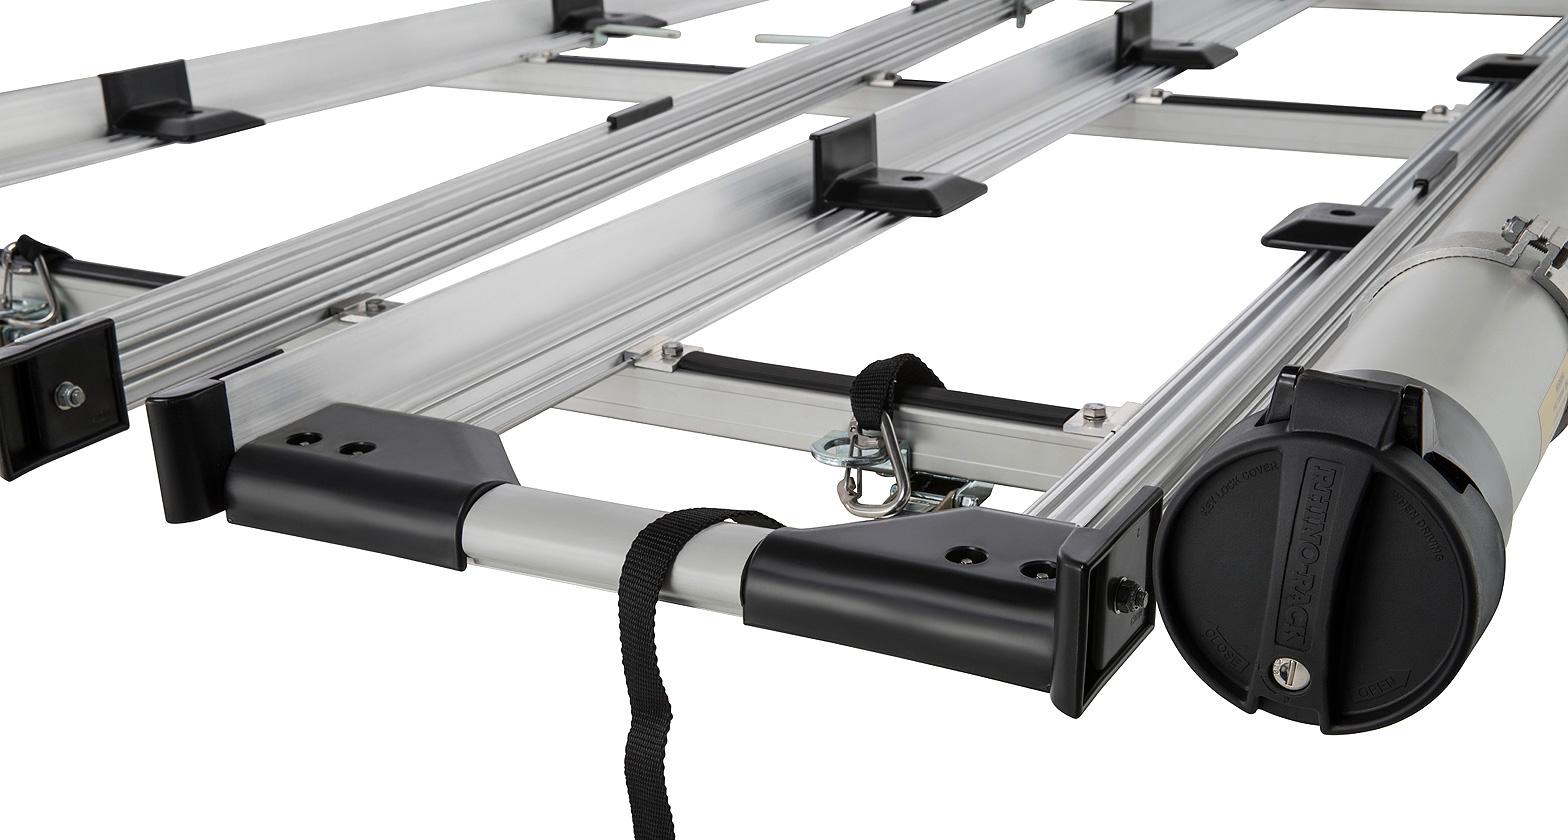 Jb0234 Multislide Double Ladder Rack System With